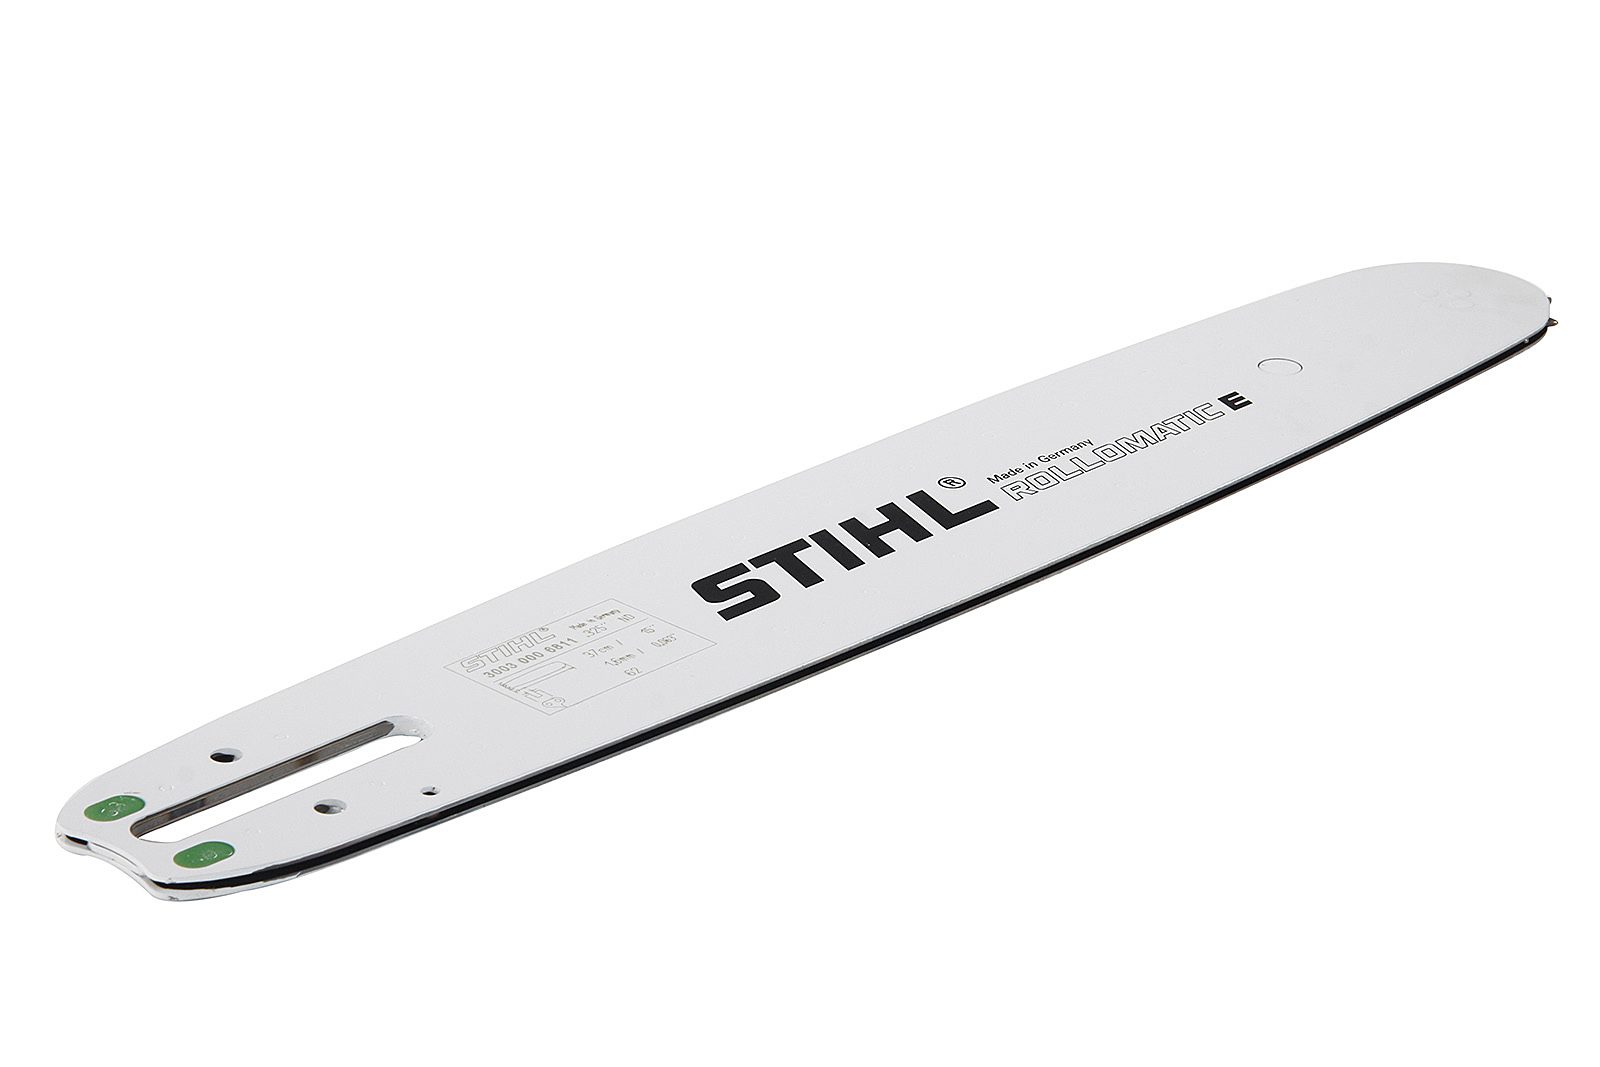 Шина цепной пилы Stihl 15'', для цепи 0.325''-1.6мм-62 susy card свеча цифра для торта радужная 5 лет